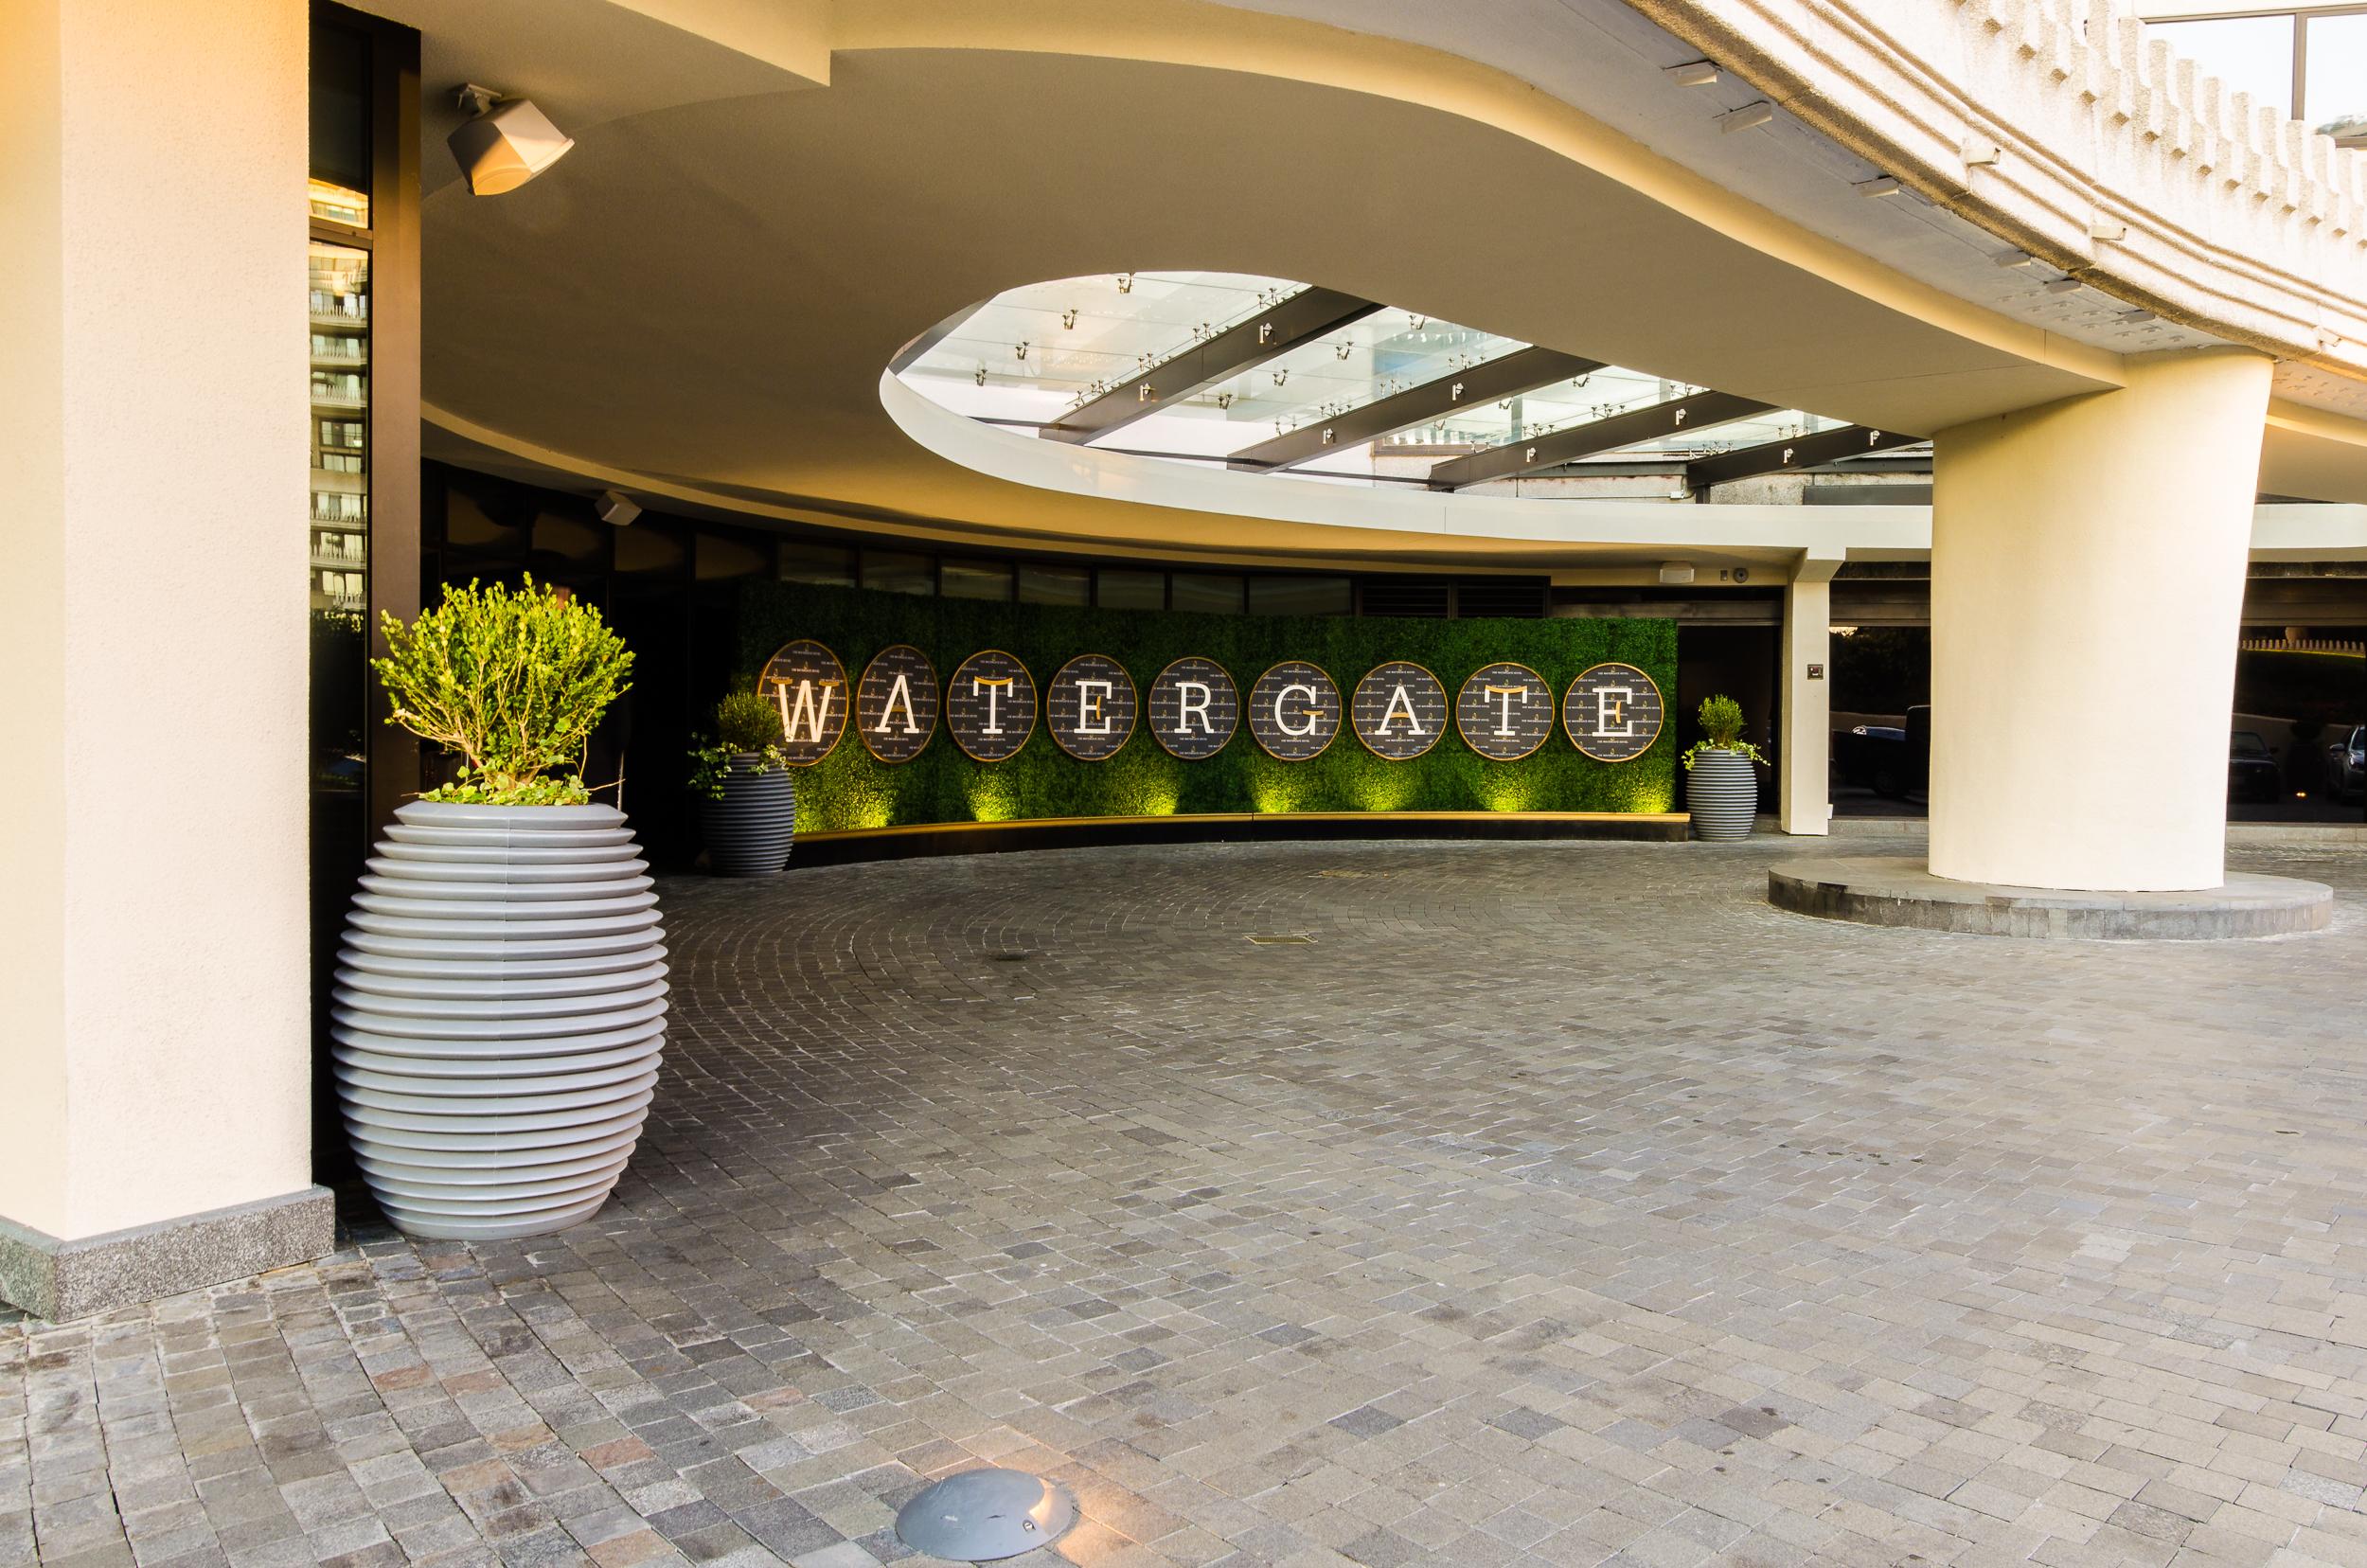 35_Watergate Hotel 01.jpg